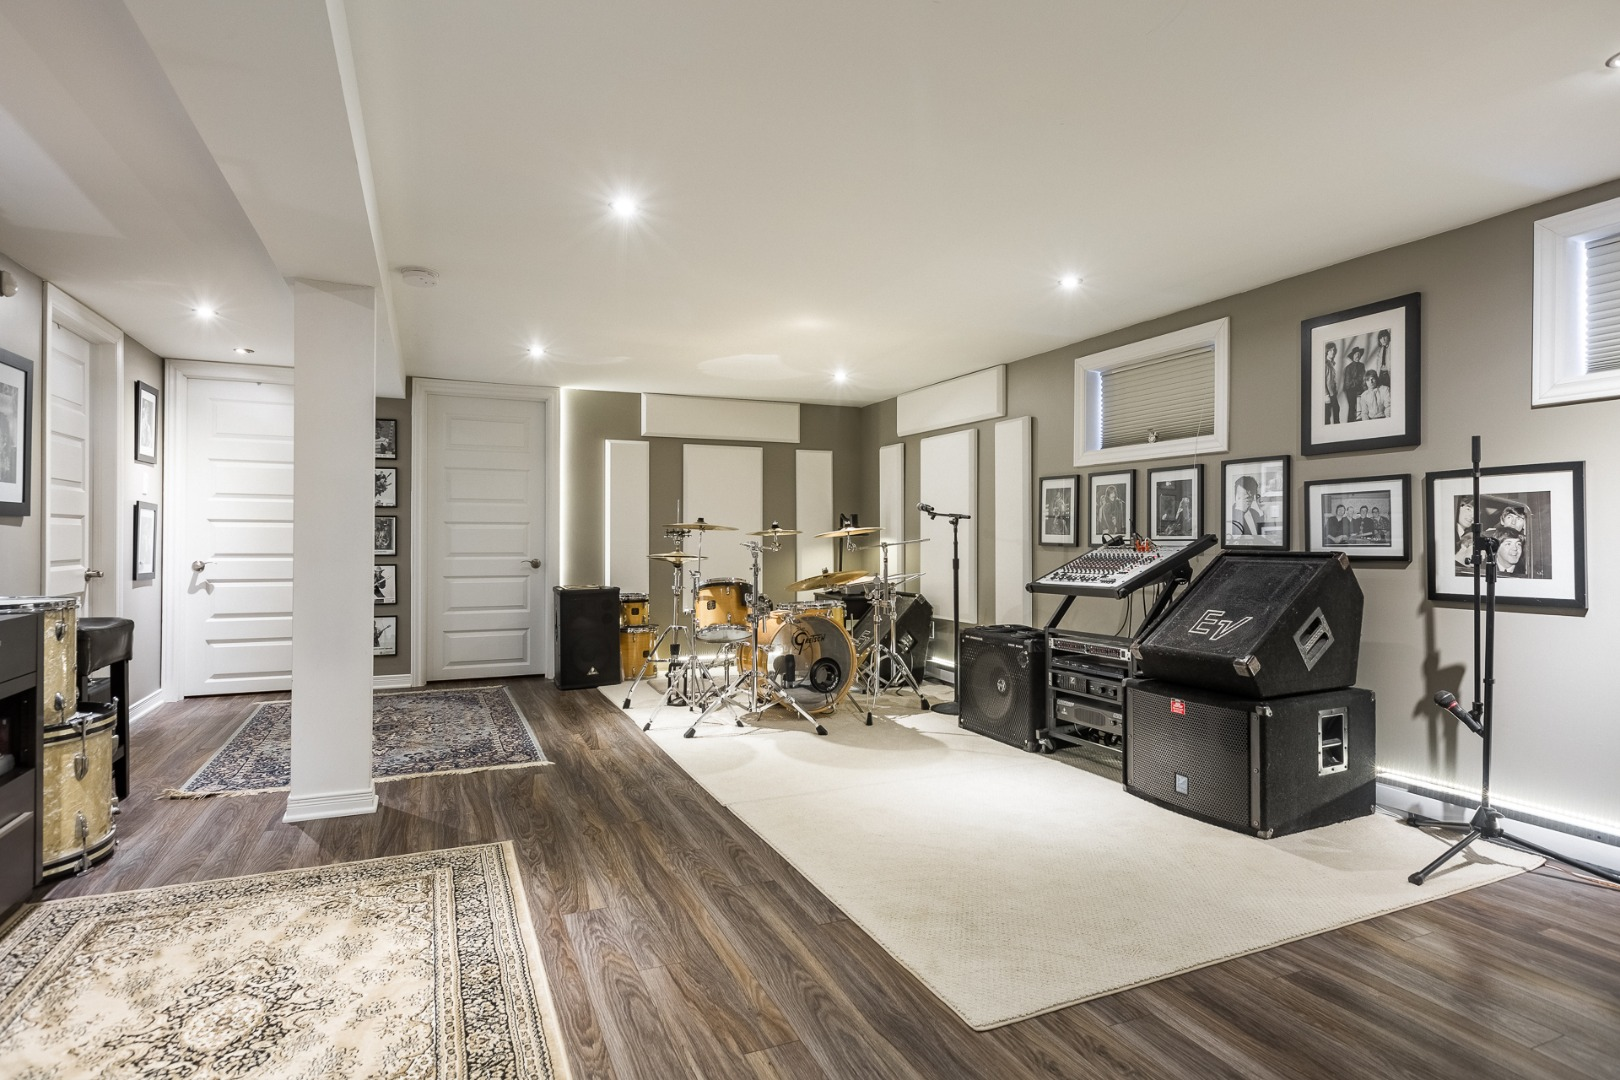 Maison à vendre Repentigny - 35, rue Bellefeuille